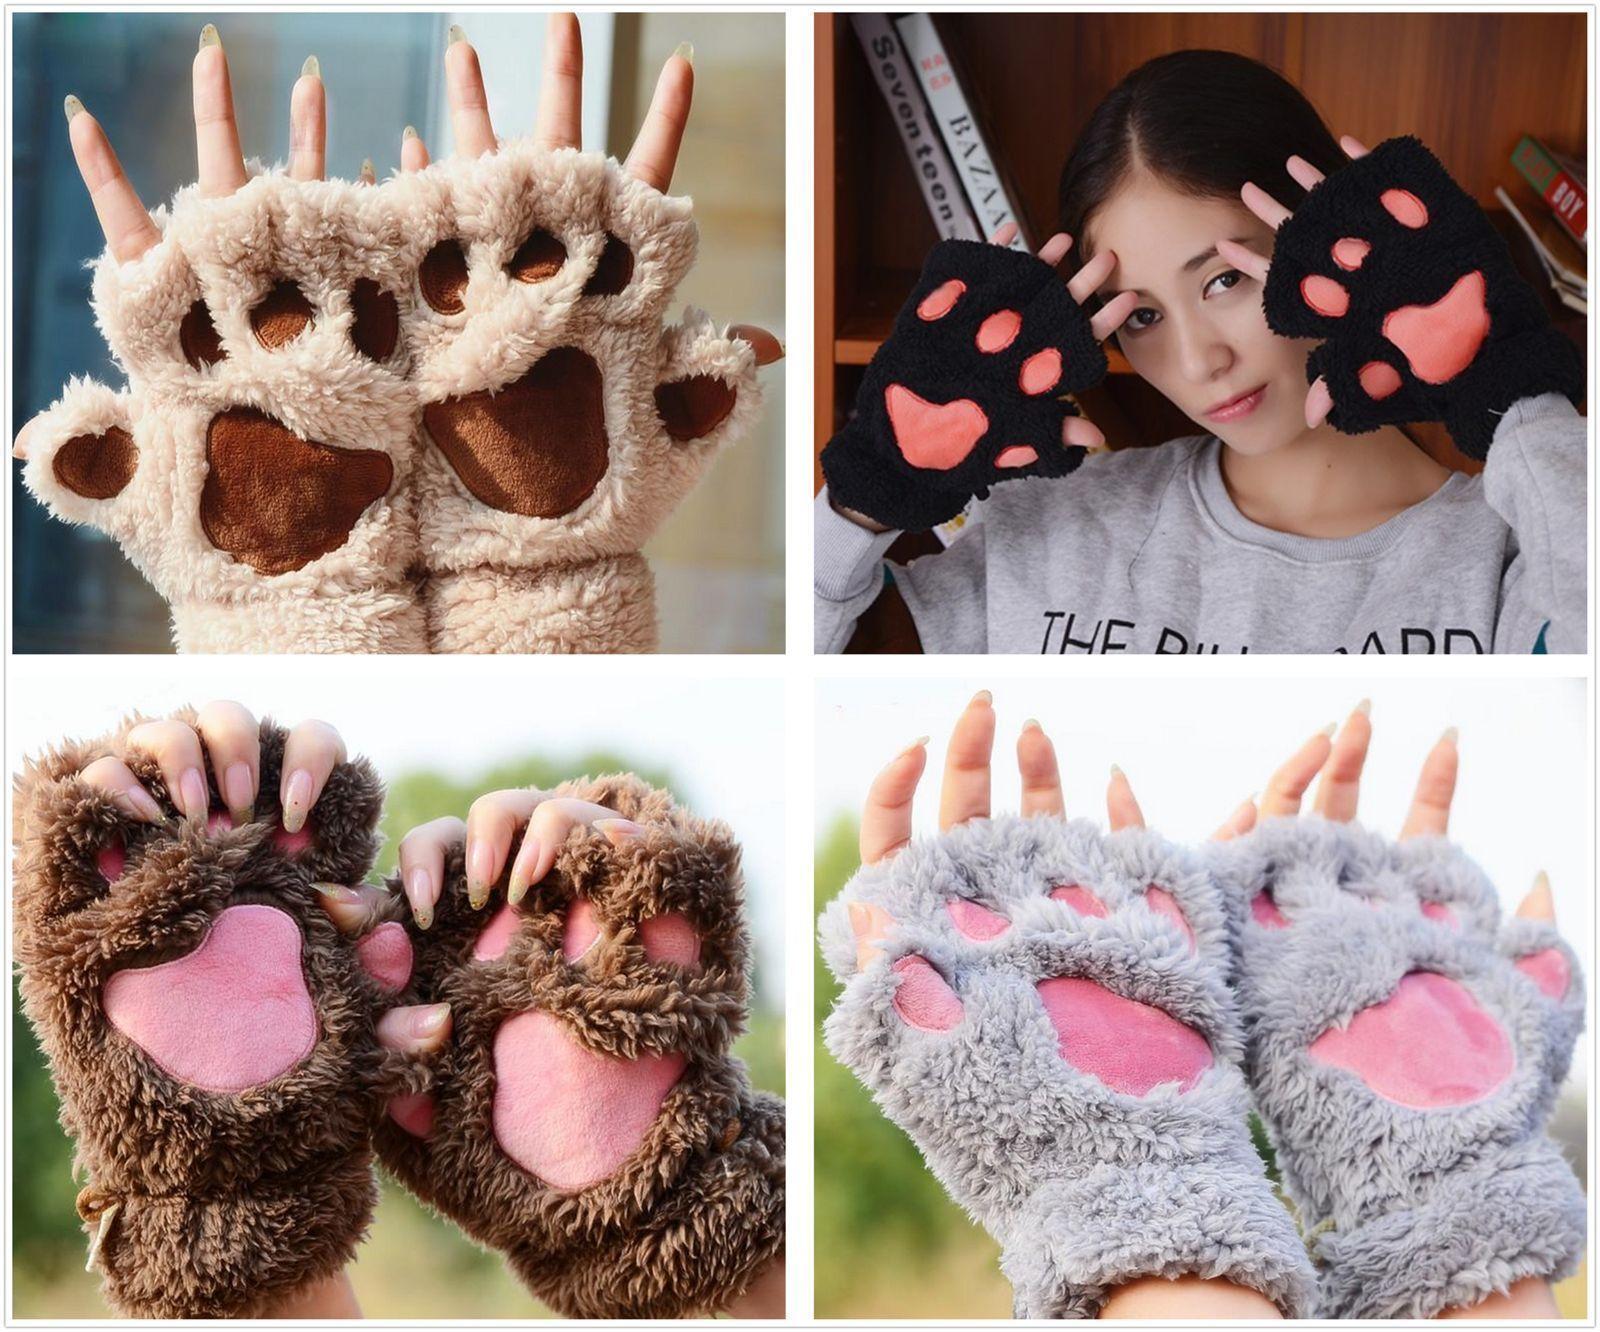 ITFABS Newest Arrivals Fashion Hot Cute Women Cat Claw Paw Mitten Plush Glove Costume Cute Winter Half Finger Gloves